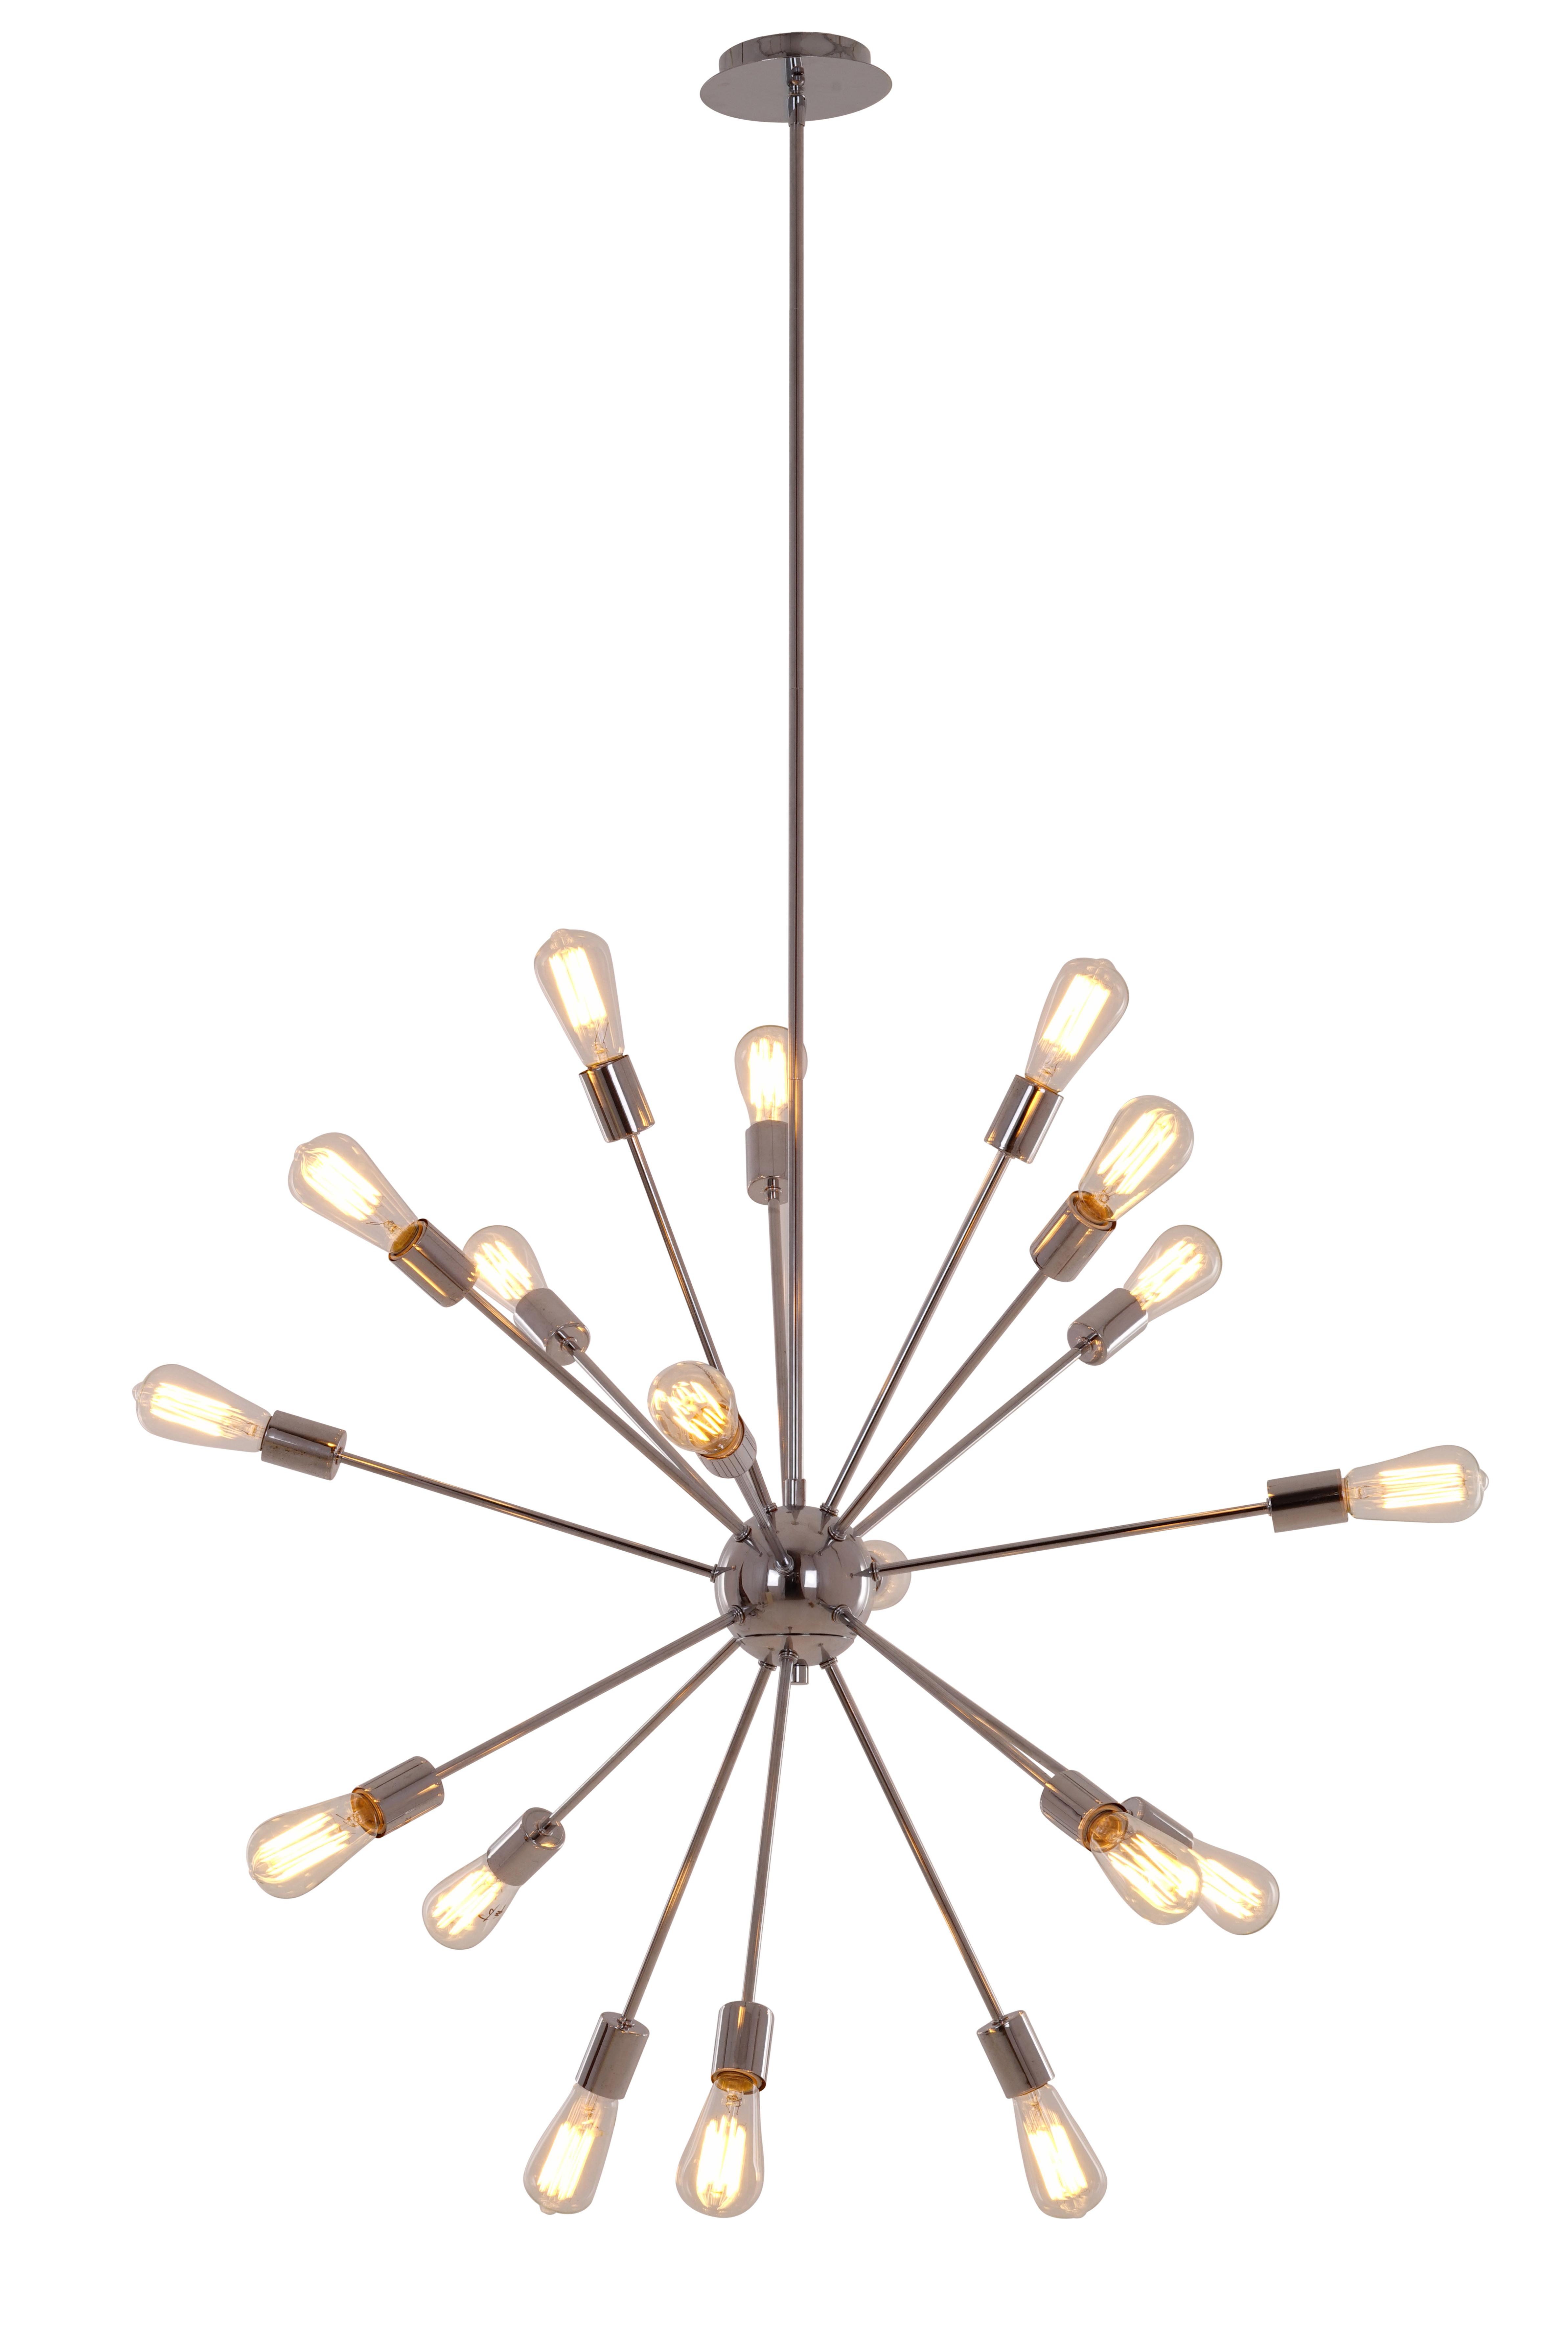 Defreitas 18 Light Sputnik Chandeliers For 2019 Bach 18 Light Chandelier (View 17 of 20)